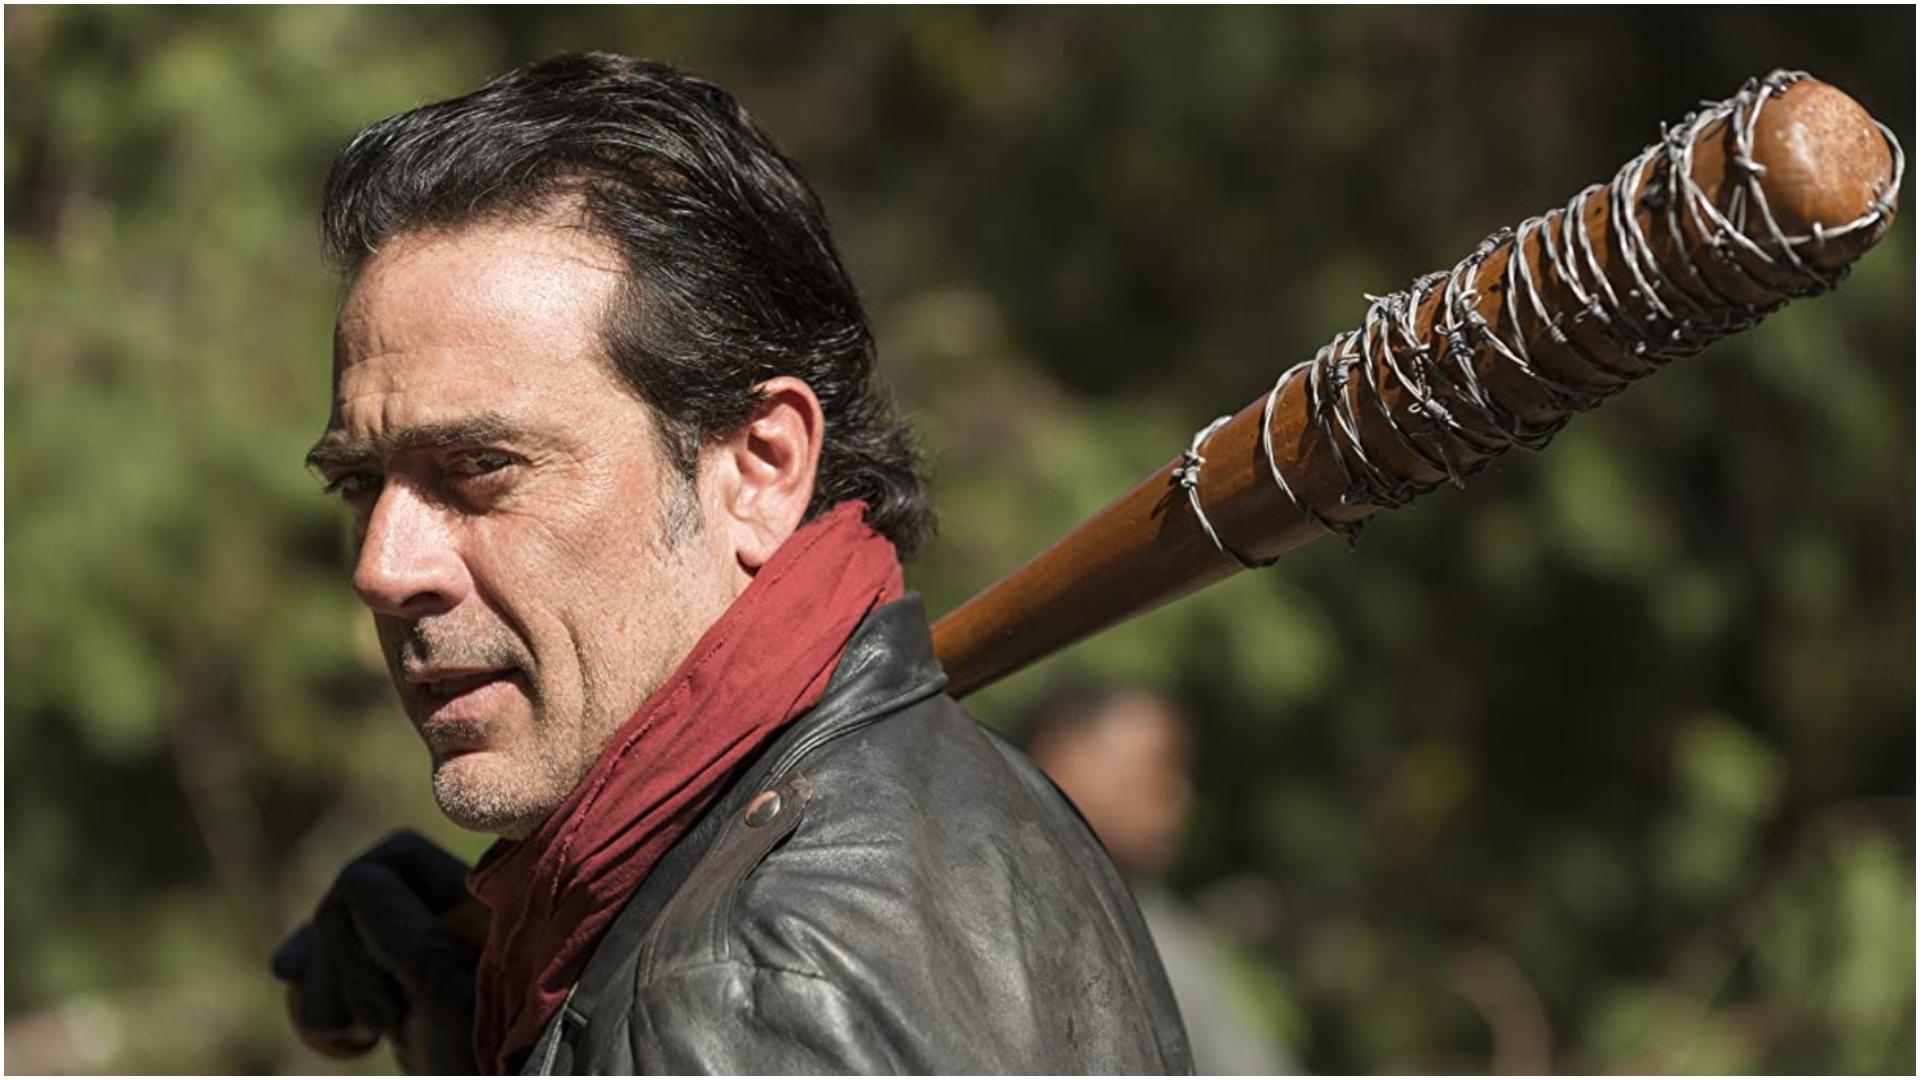 Walking Dead 2022 Calendar.The Walking Dead Season 11 Return Date When Are New Episodes Airing Gamesradar